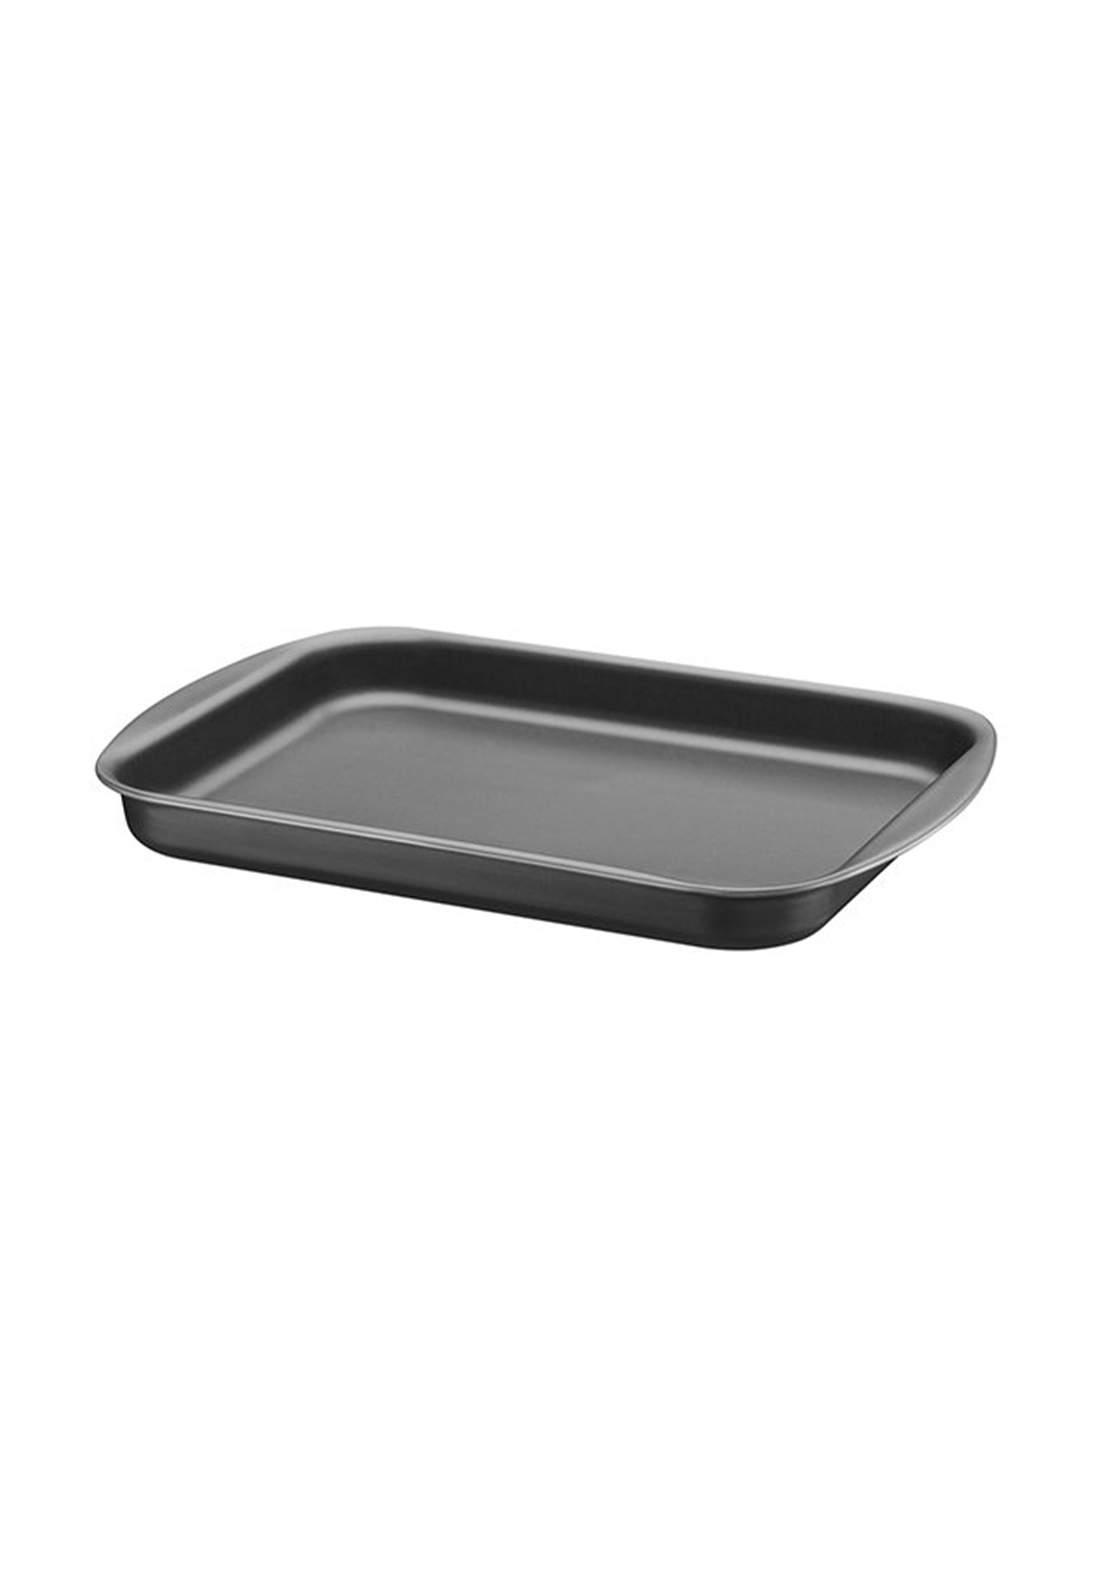 Tramontina '20053-034 Aluminum Flat Baking Tray 34 cm Black تبسي منخفض العمق